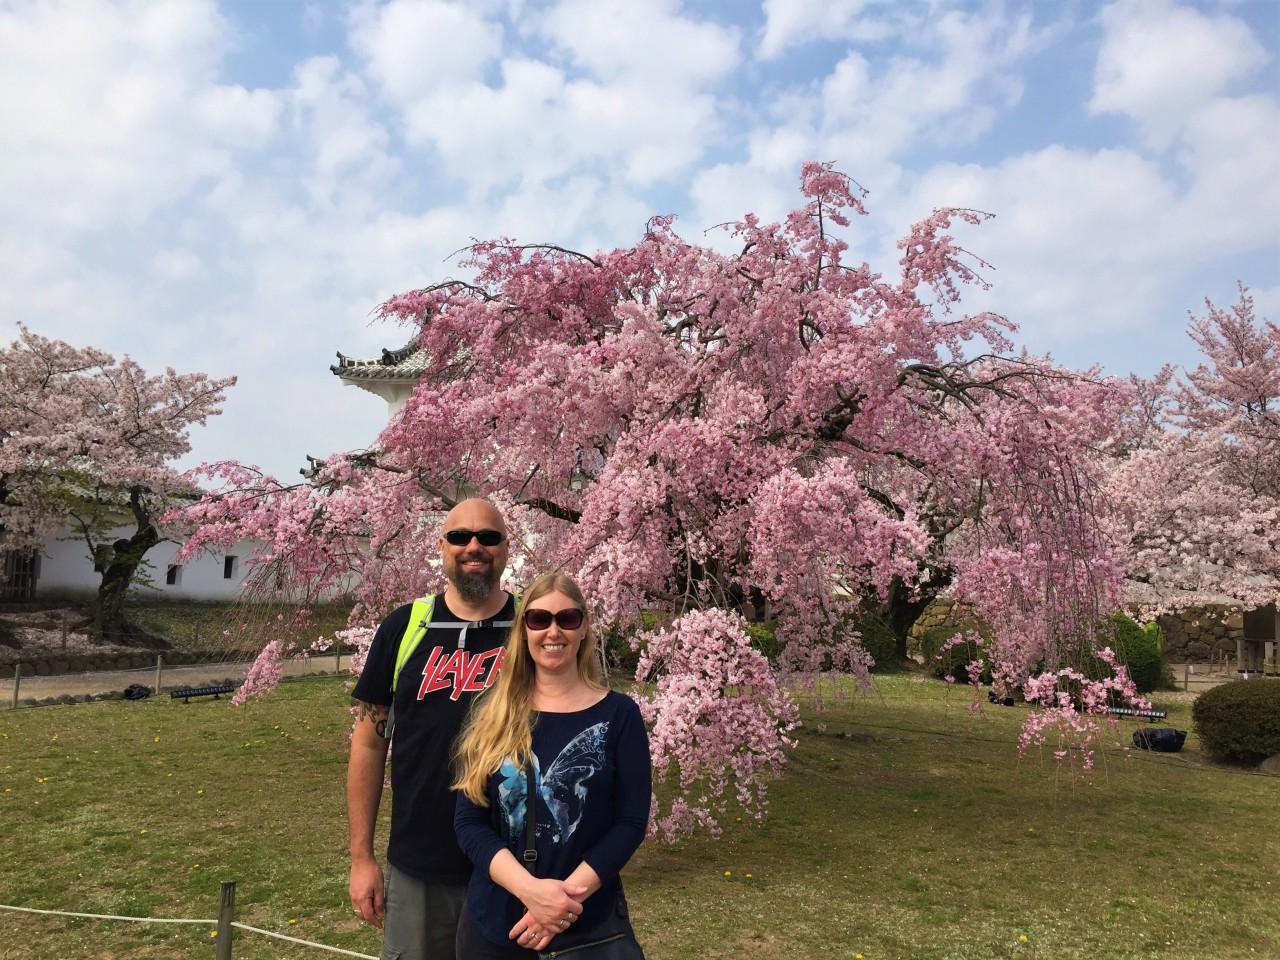 The Sakura, Japan's Cherry BlossomingSeason